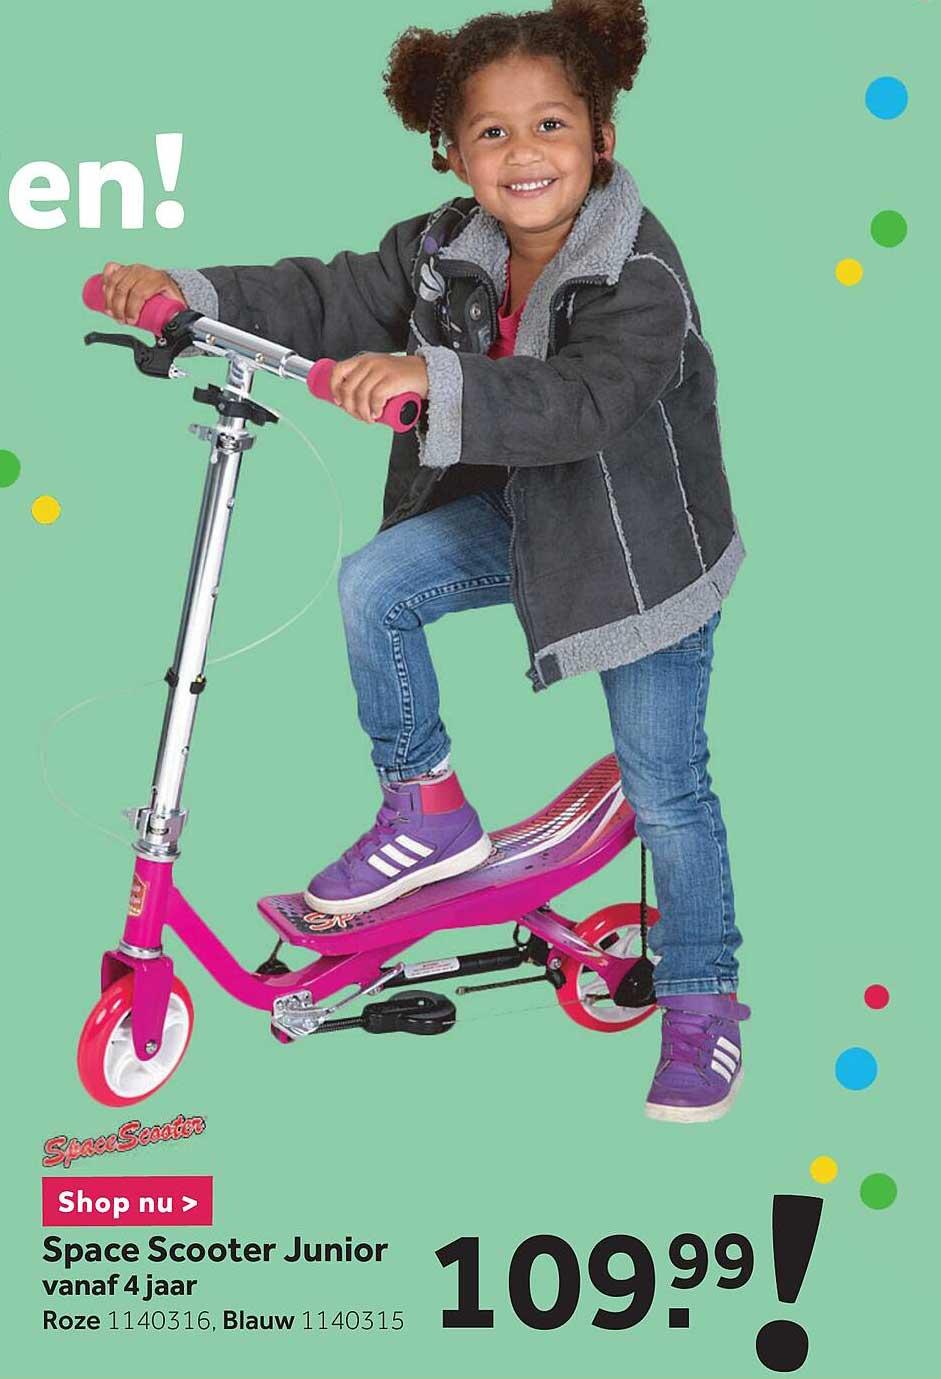 Intertoys Space Scooter Junior